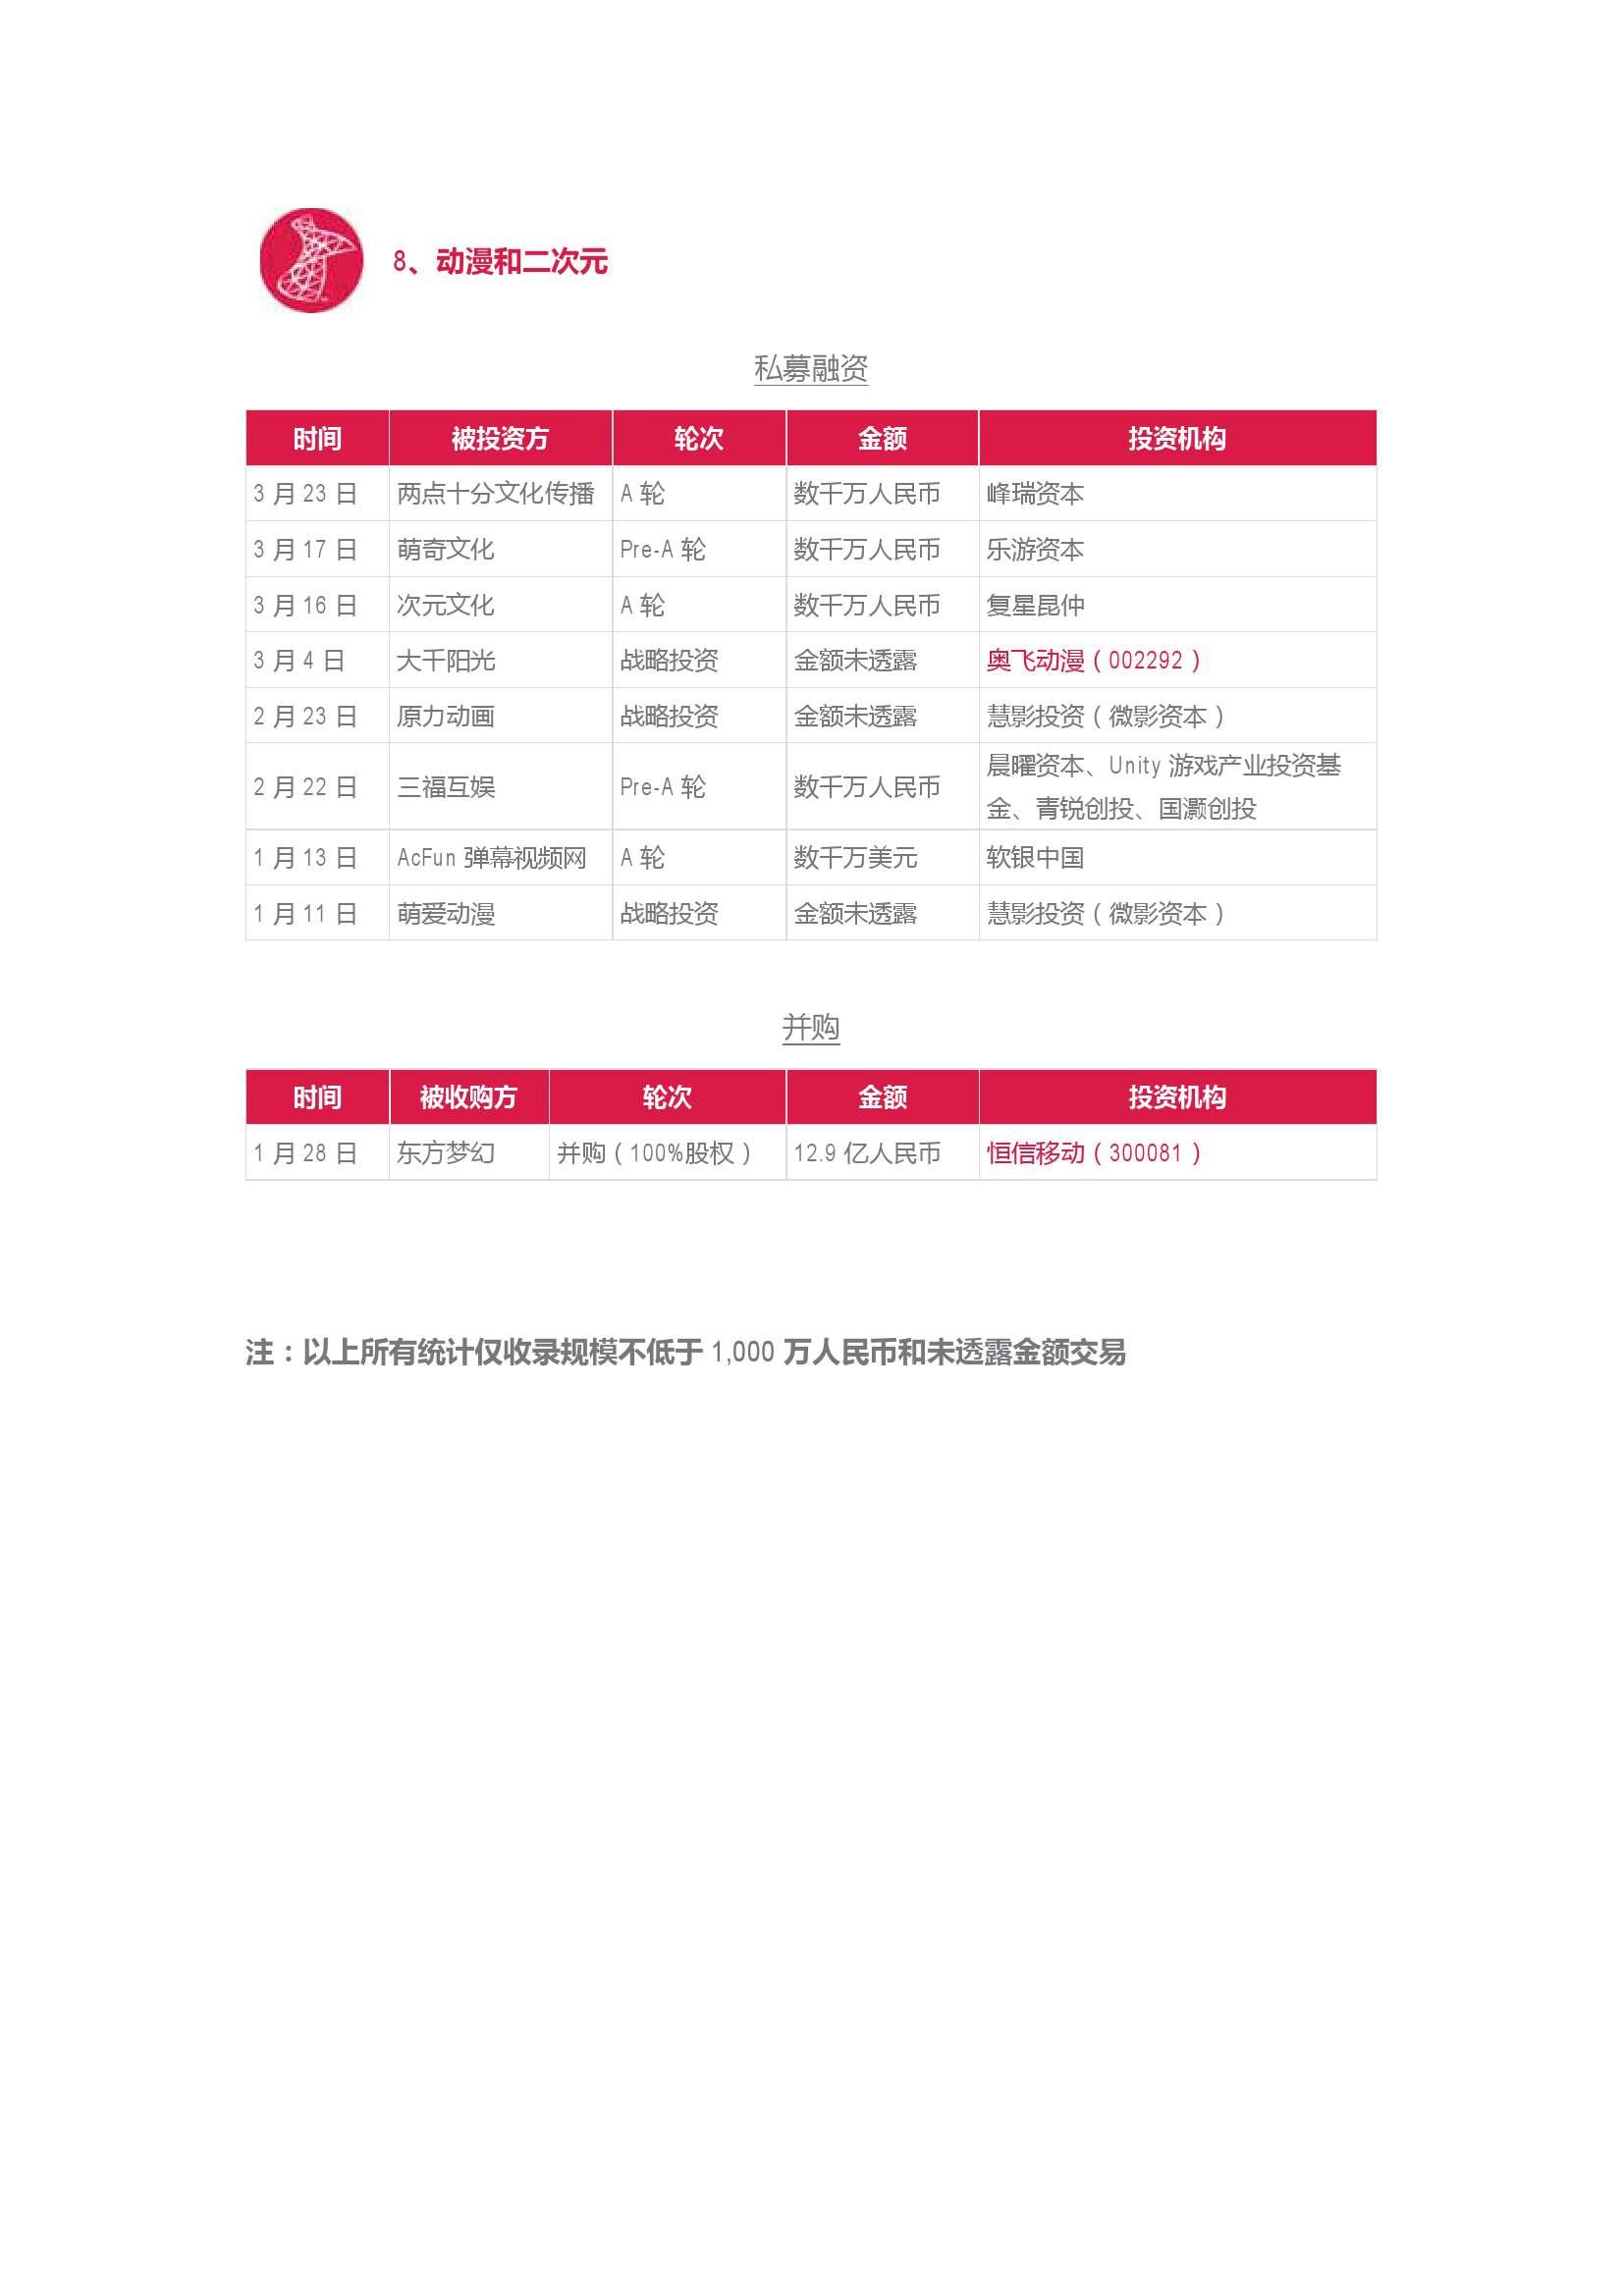 2016Q1中国娱乐产业季度观察_000015